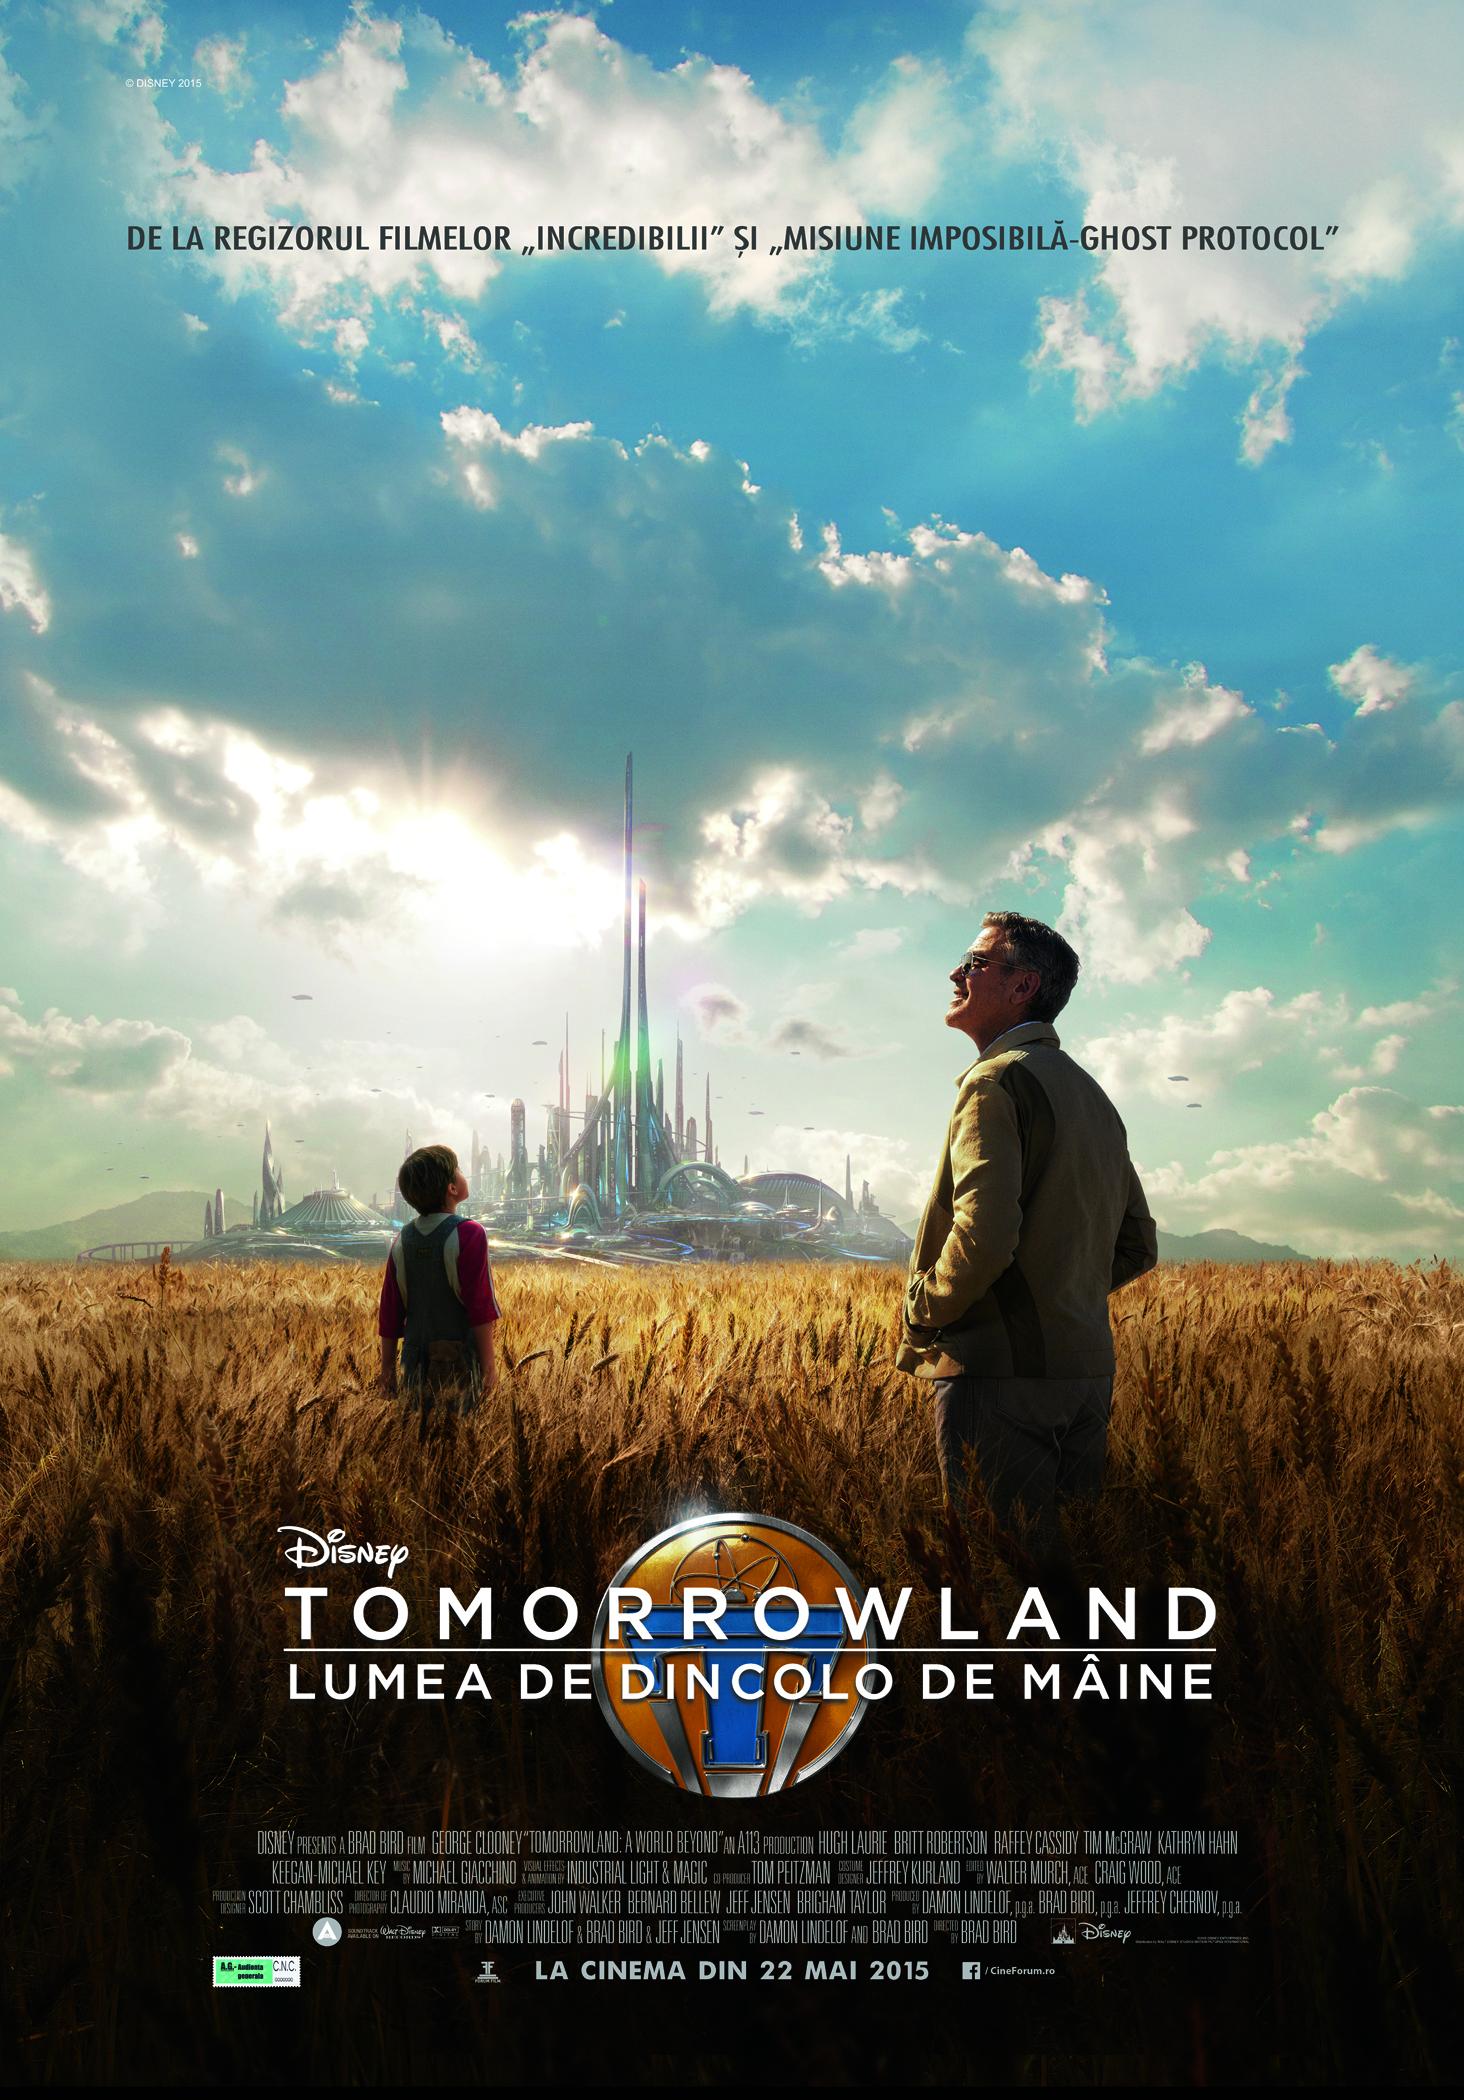 Tomorrowland: Lumea de dincolo de maine (Premiera)